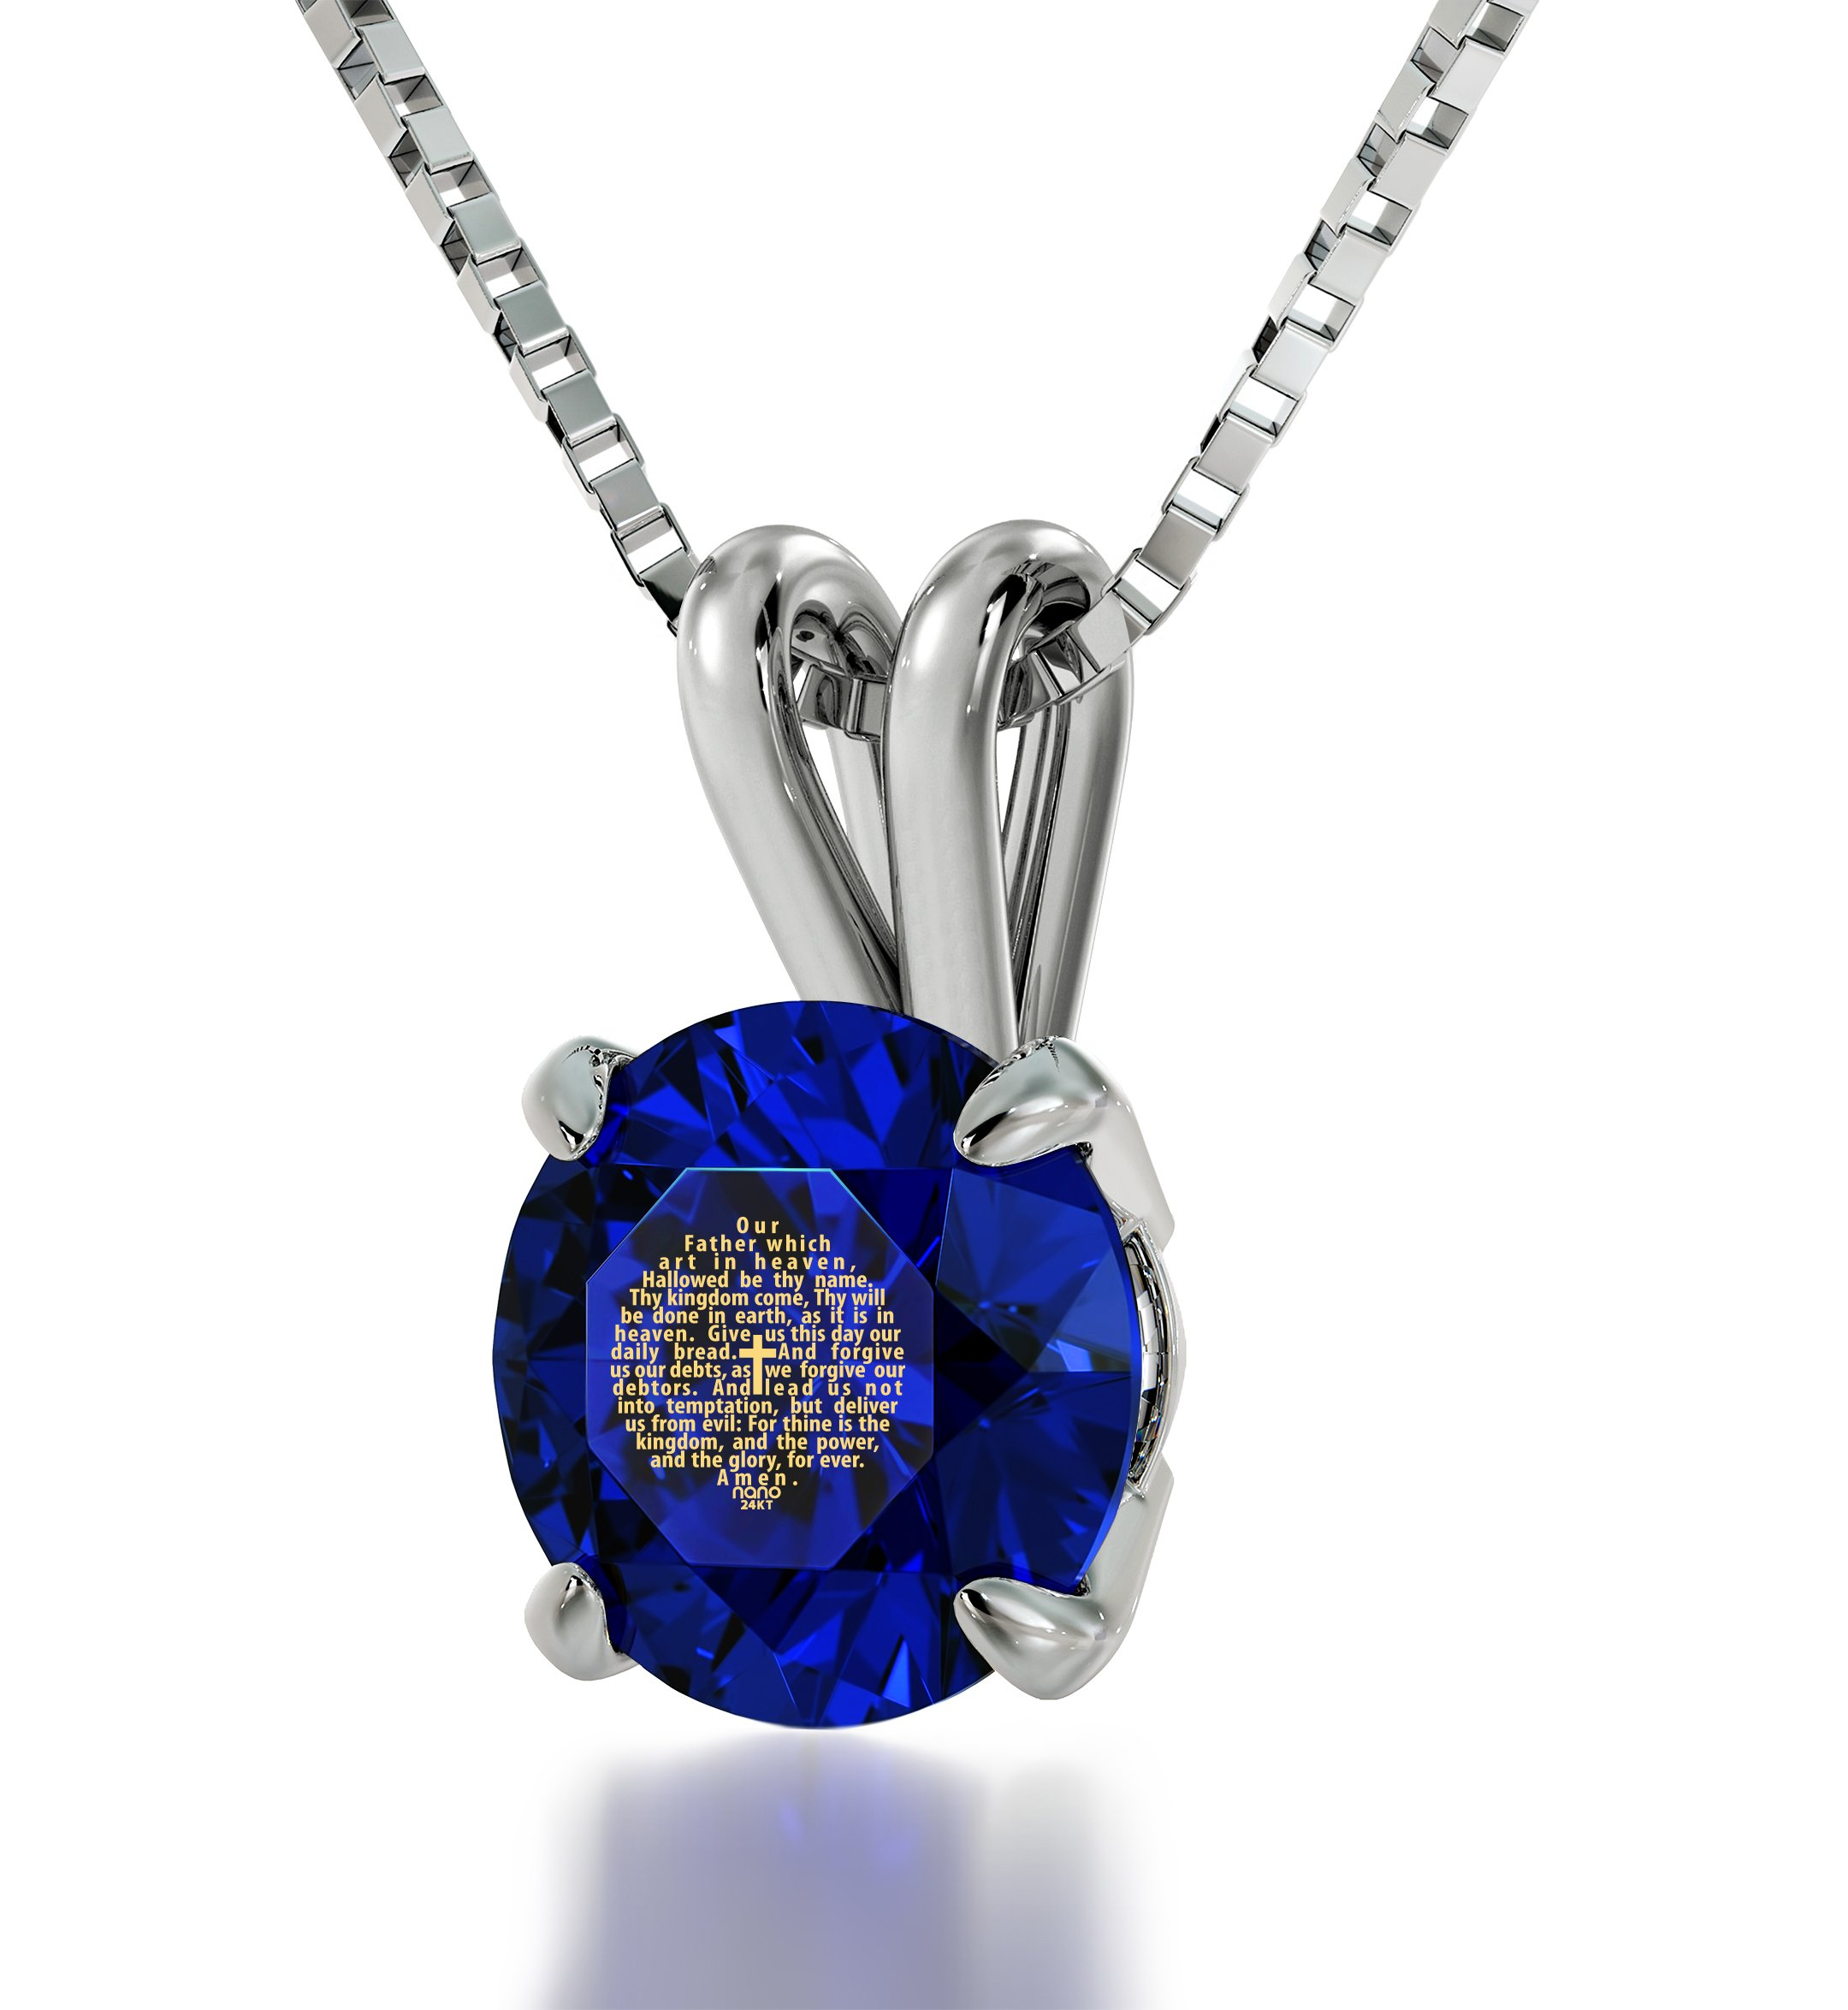 925 Sterling Silver Lord's Prayer Necklace Christian Pendant King James Version Inscribed in 24k Gold on Blue Swarovski Crystal, 18''